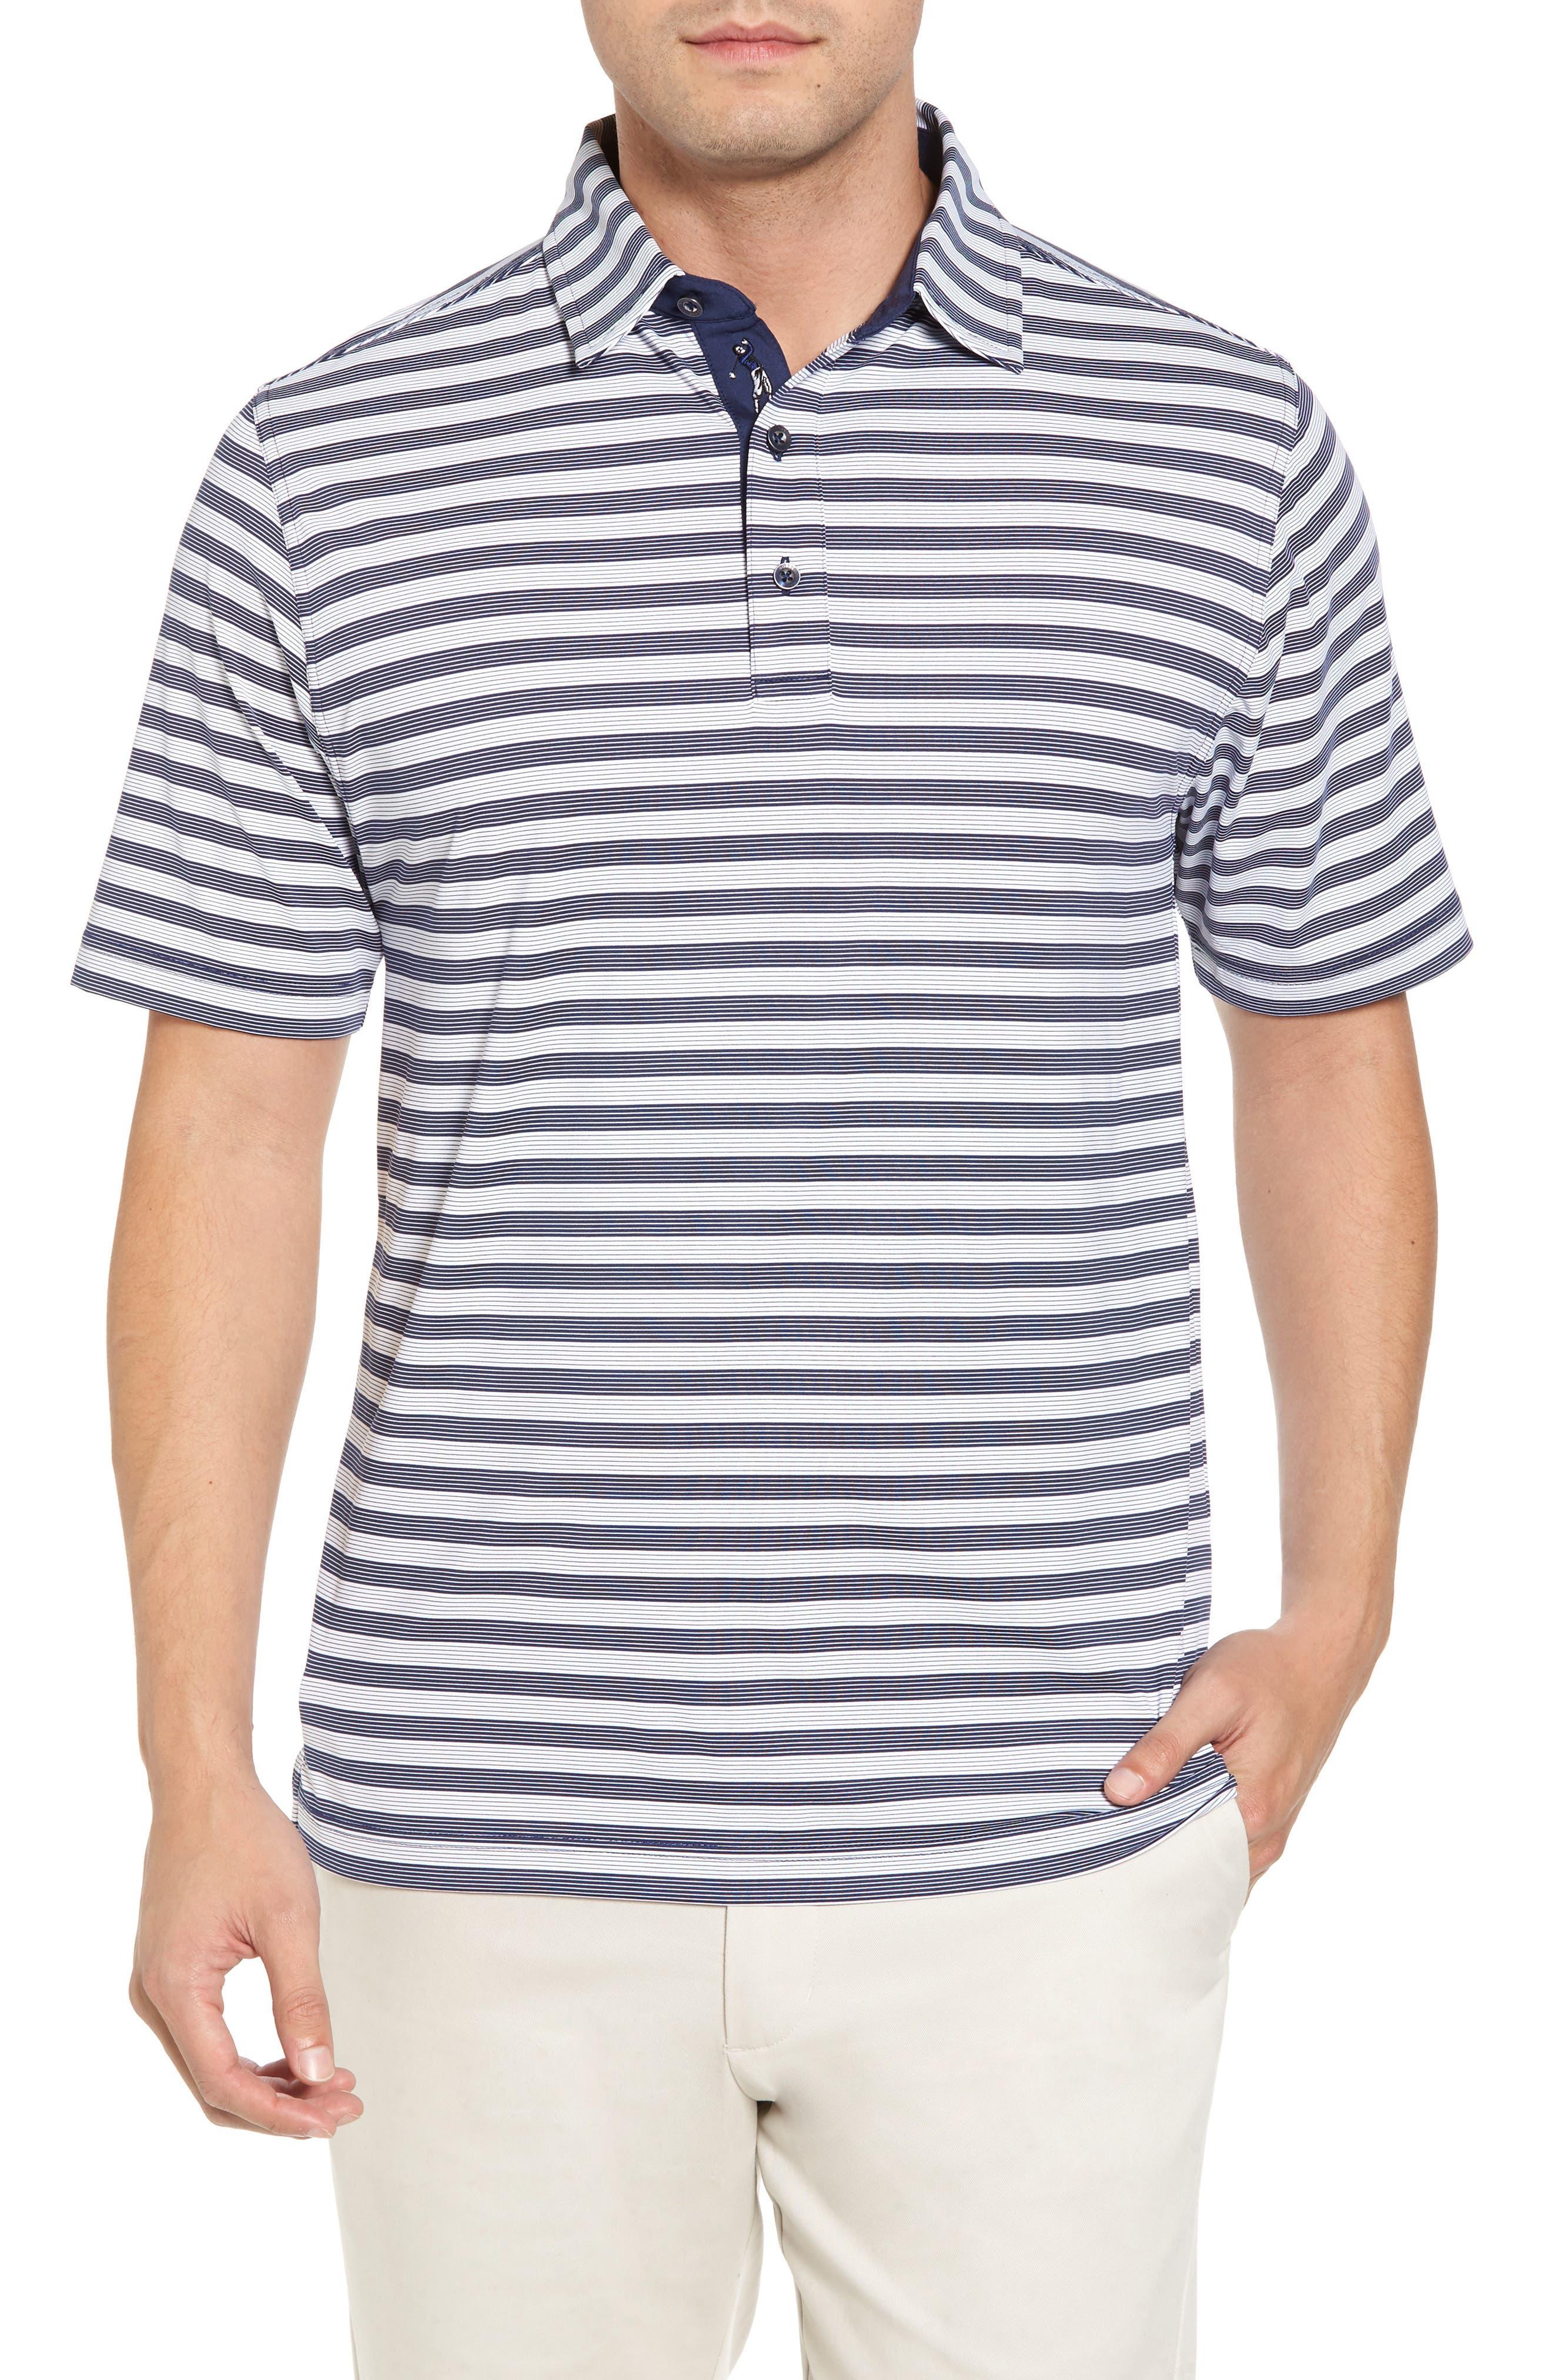 XH2O Del Mar Stripe Jersey Polo,                             Main thumbnail 1, color,                             Summer Navy